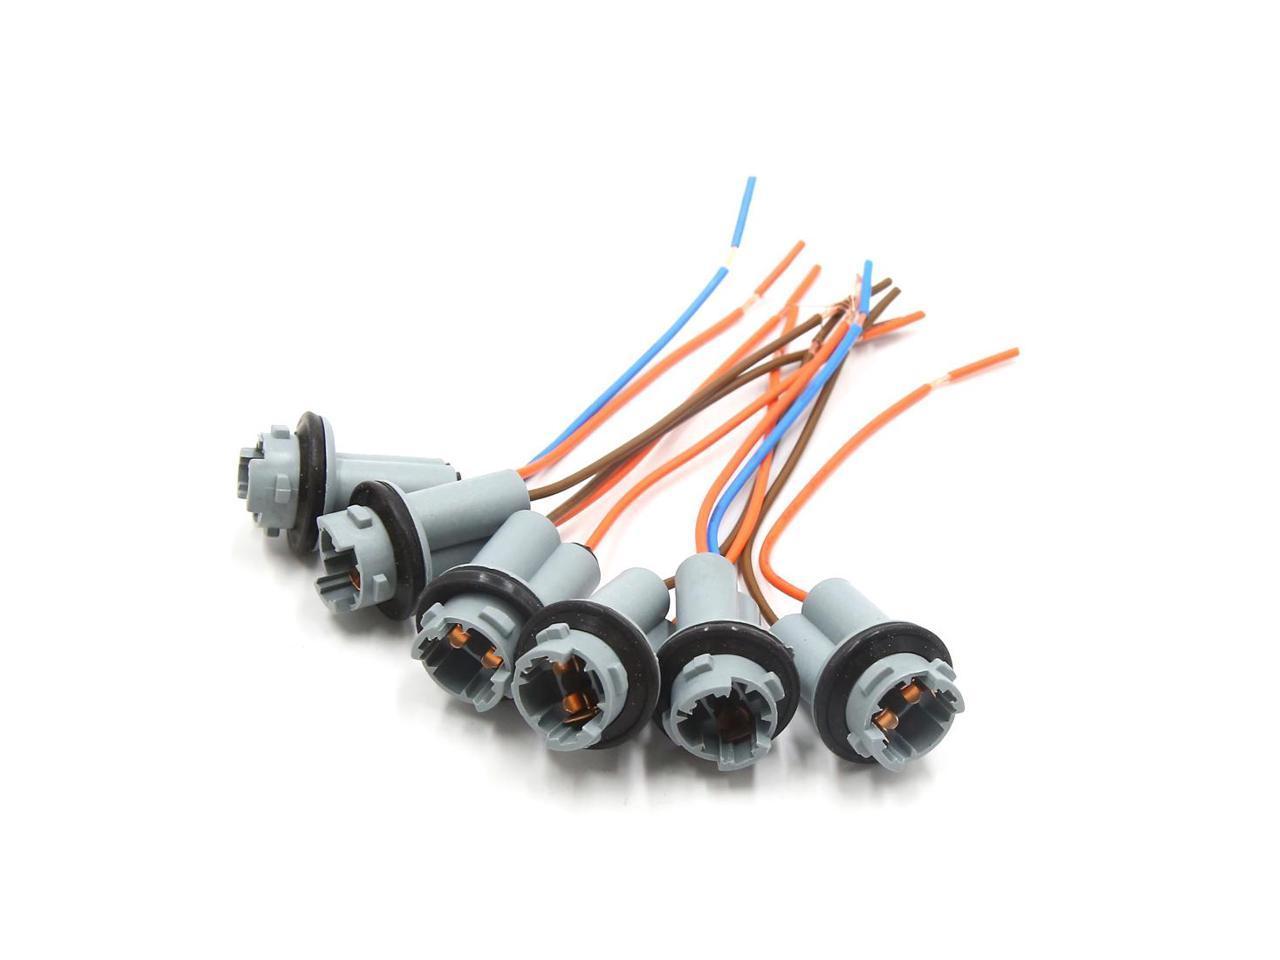 6Pcs Plastic Car T10 Light Lamp Bulb Extension Wiring Harness Socket Connector